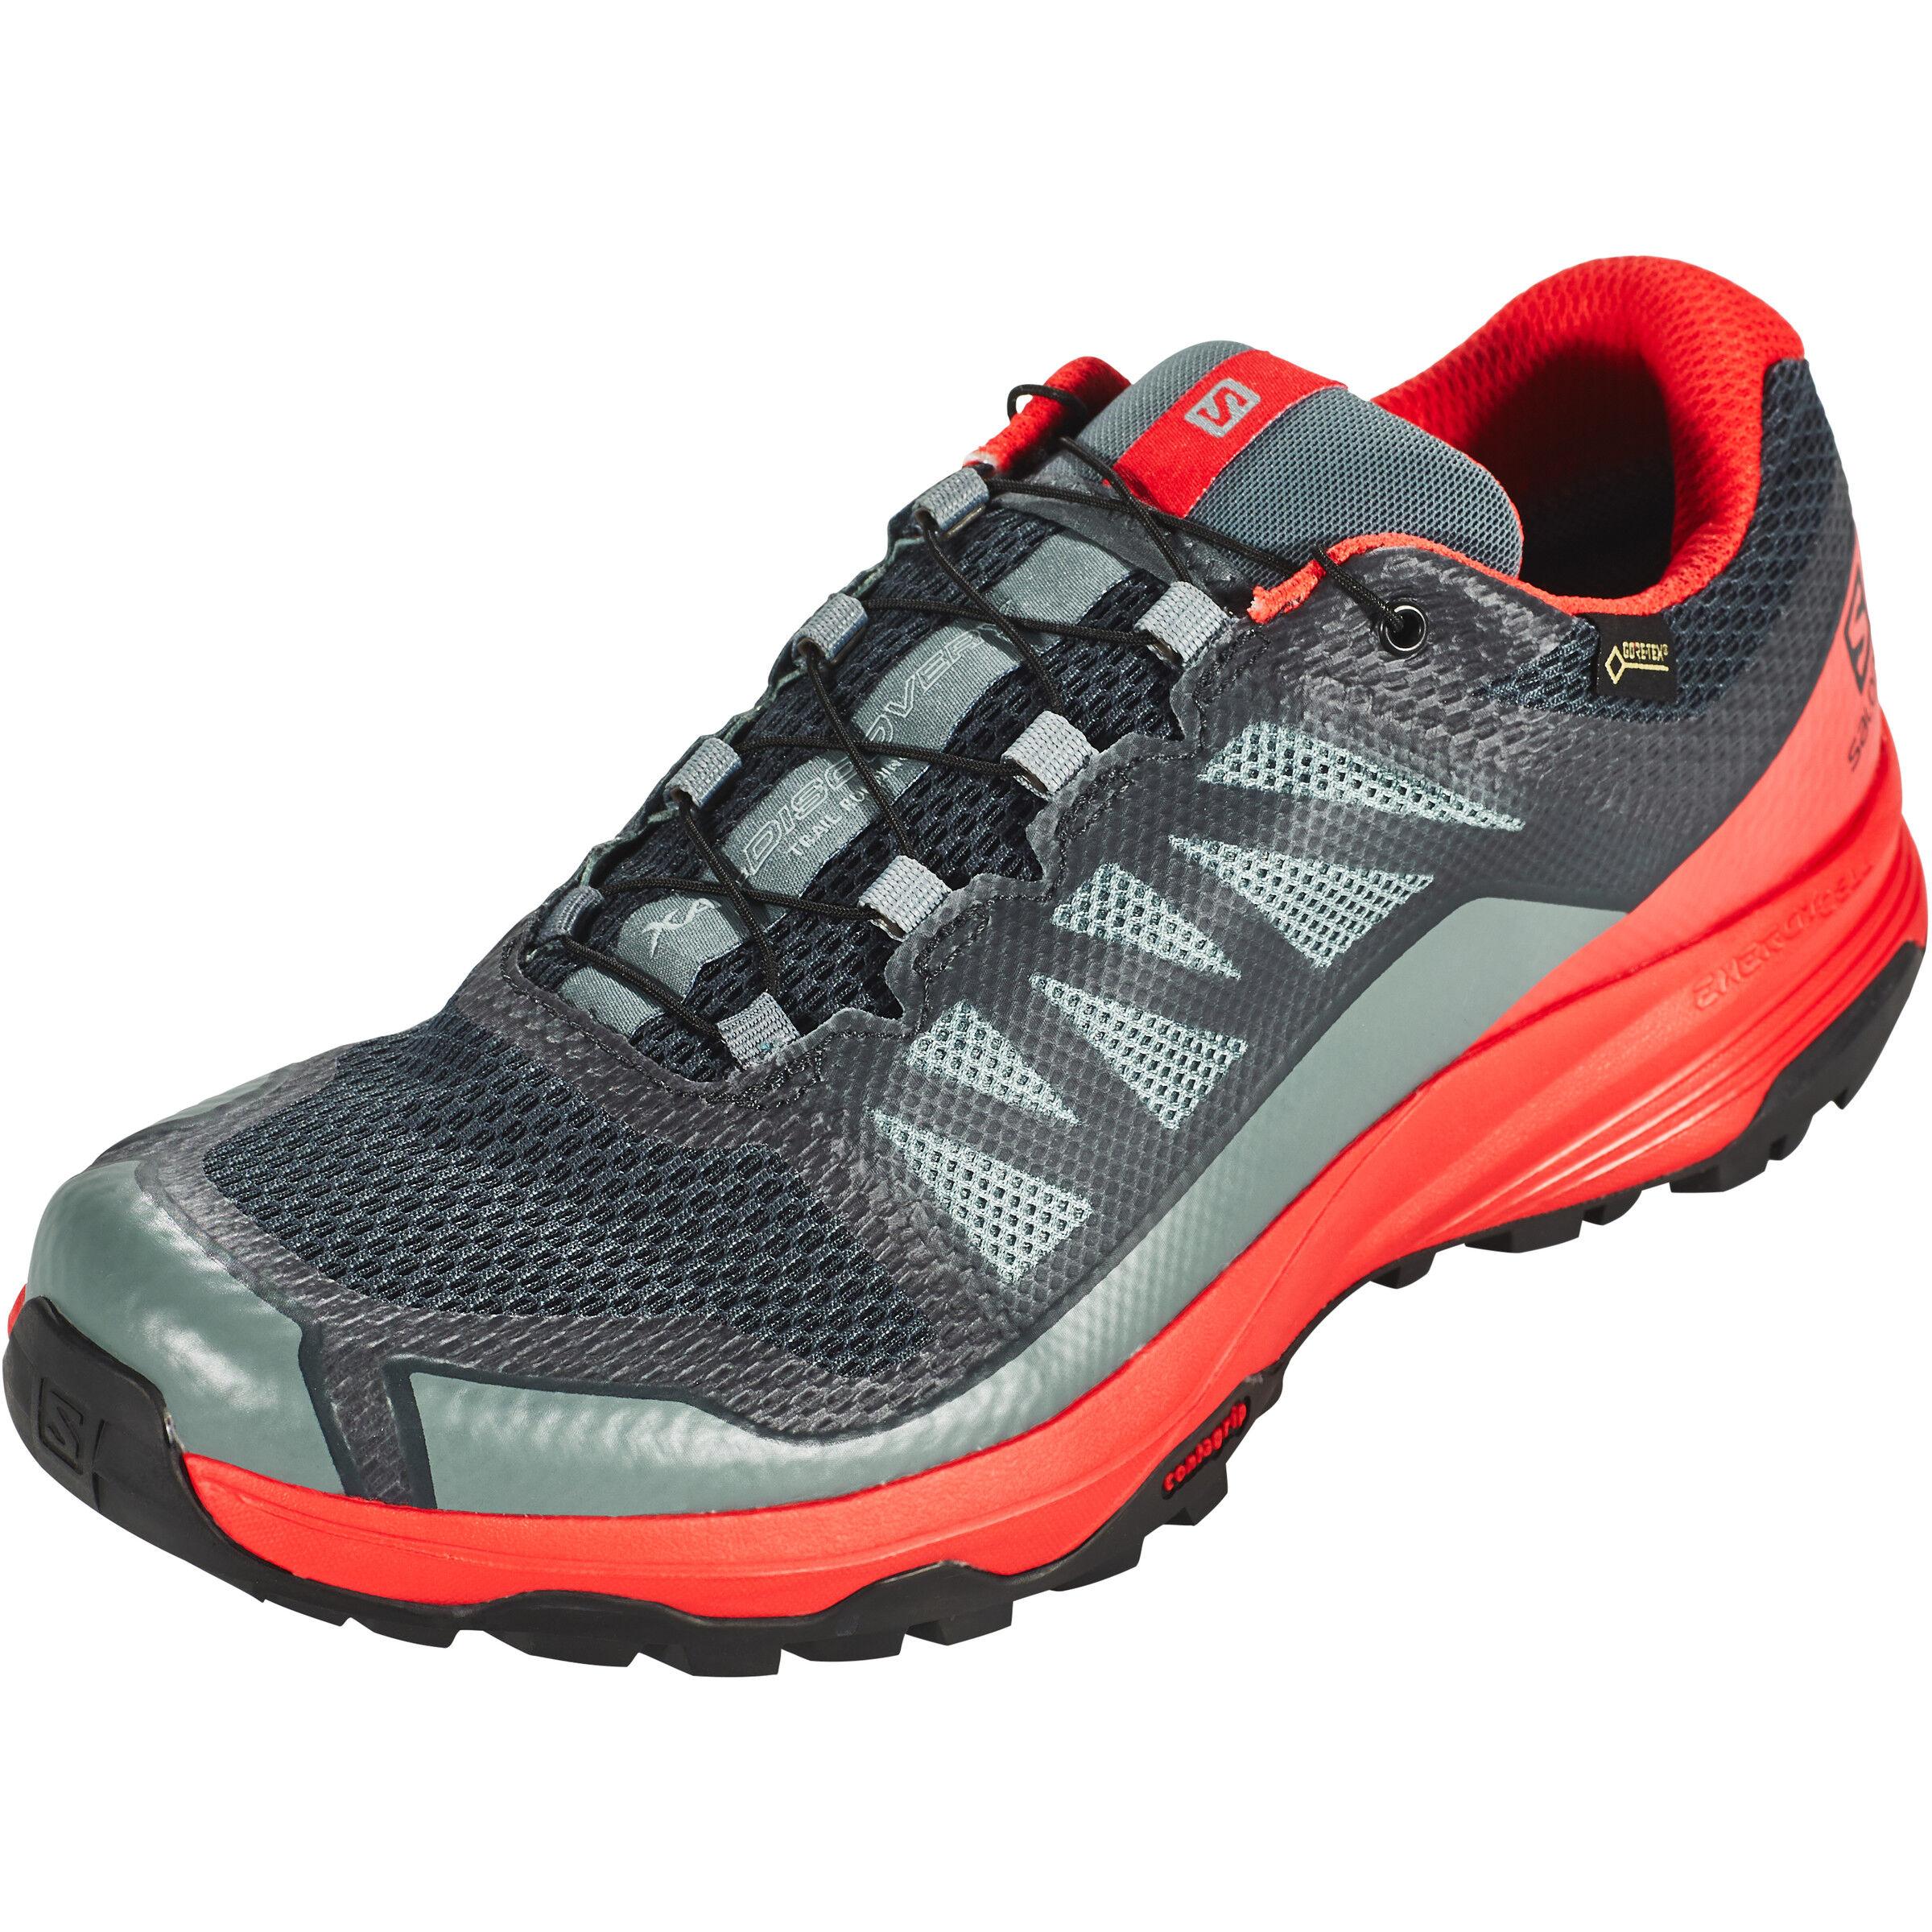 Salomon XA Discovery GTX Shoes Herren stormy weatherhigh risk redblack